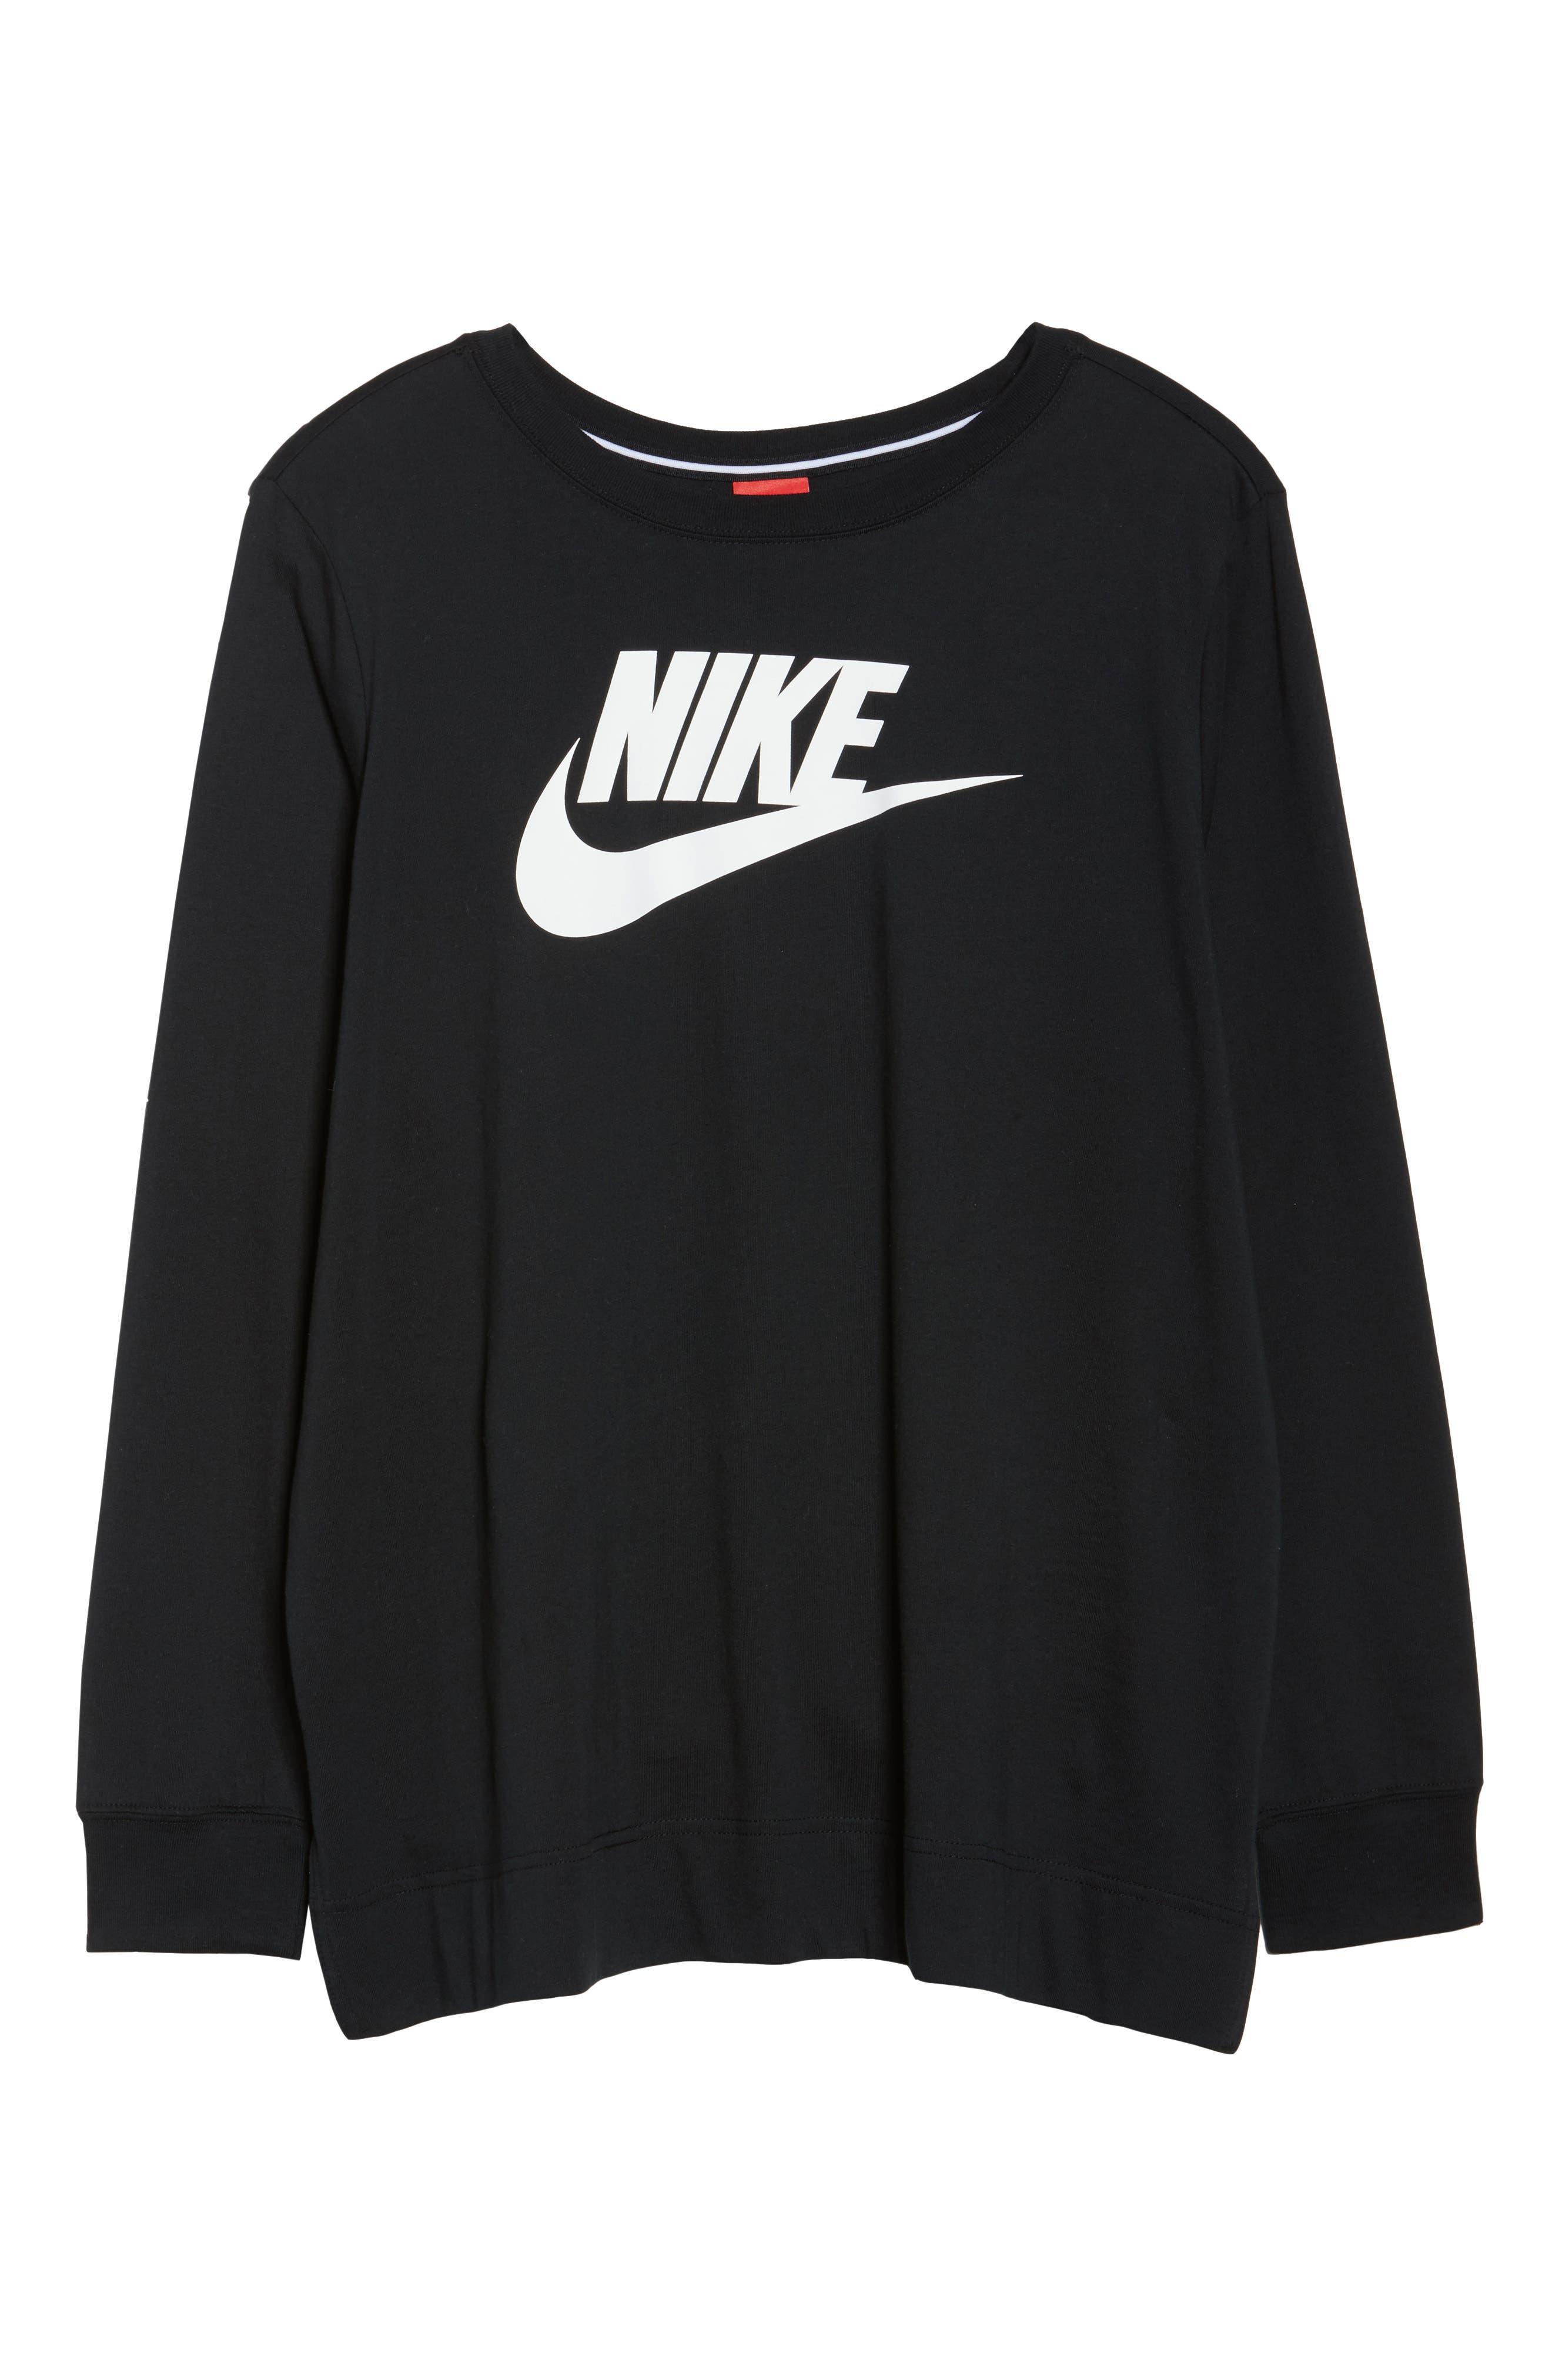 Sportswear Long Sleeve Tee,                             Alternate thumbnail 6, color,                             Black/ White